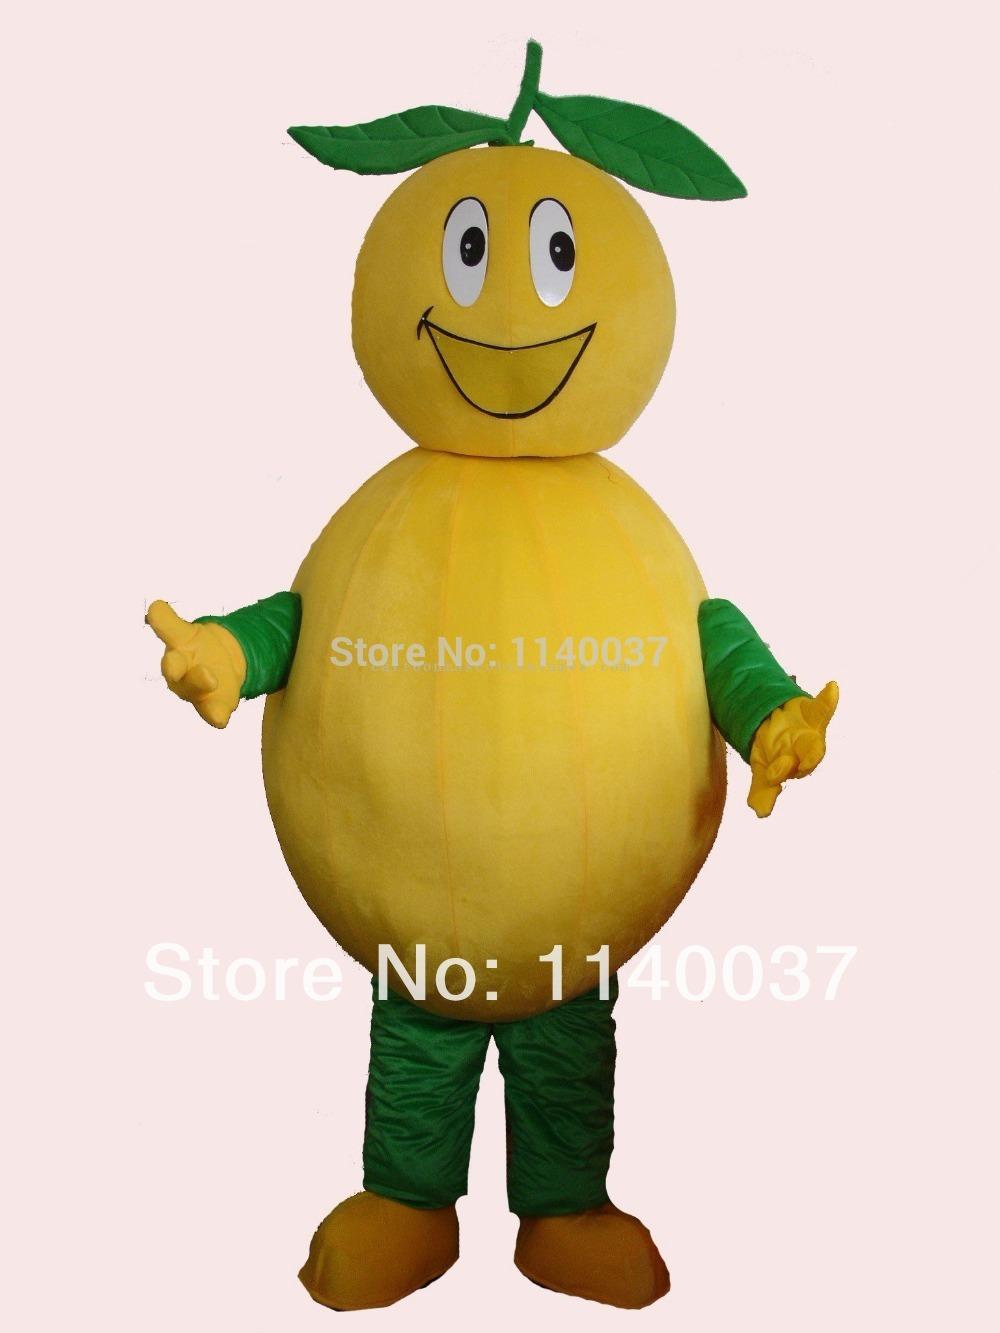 Костюм лимон для мальчика своими руками 26